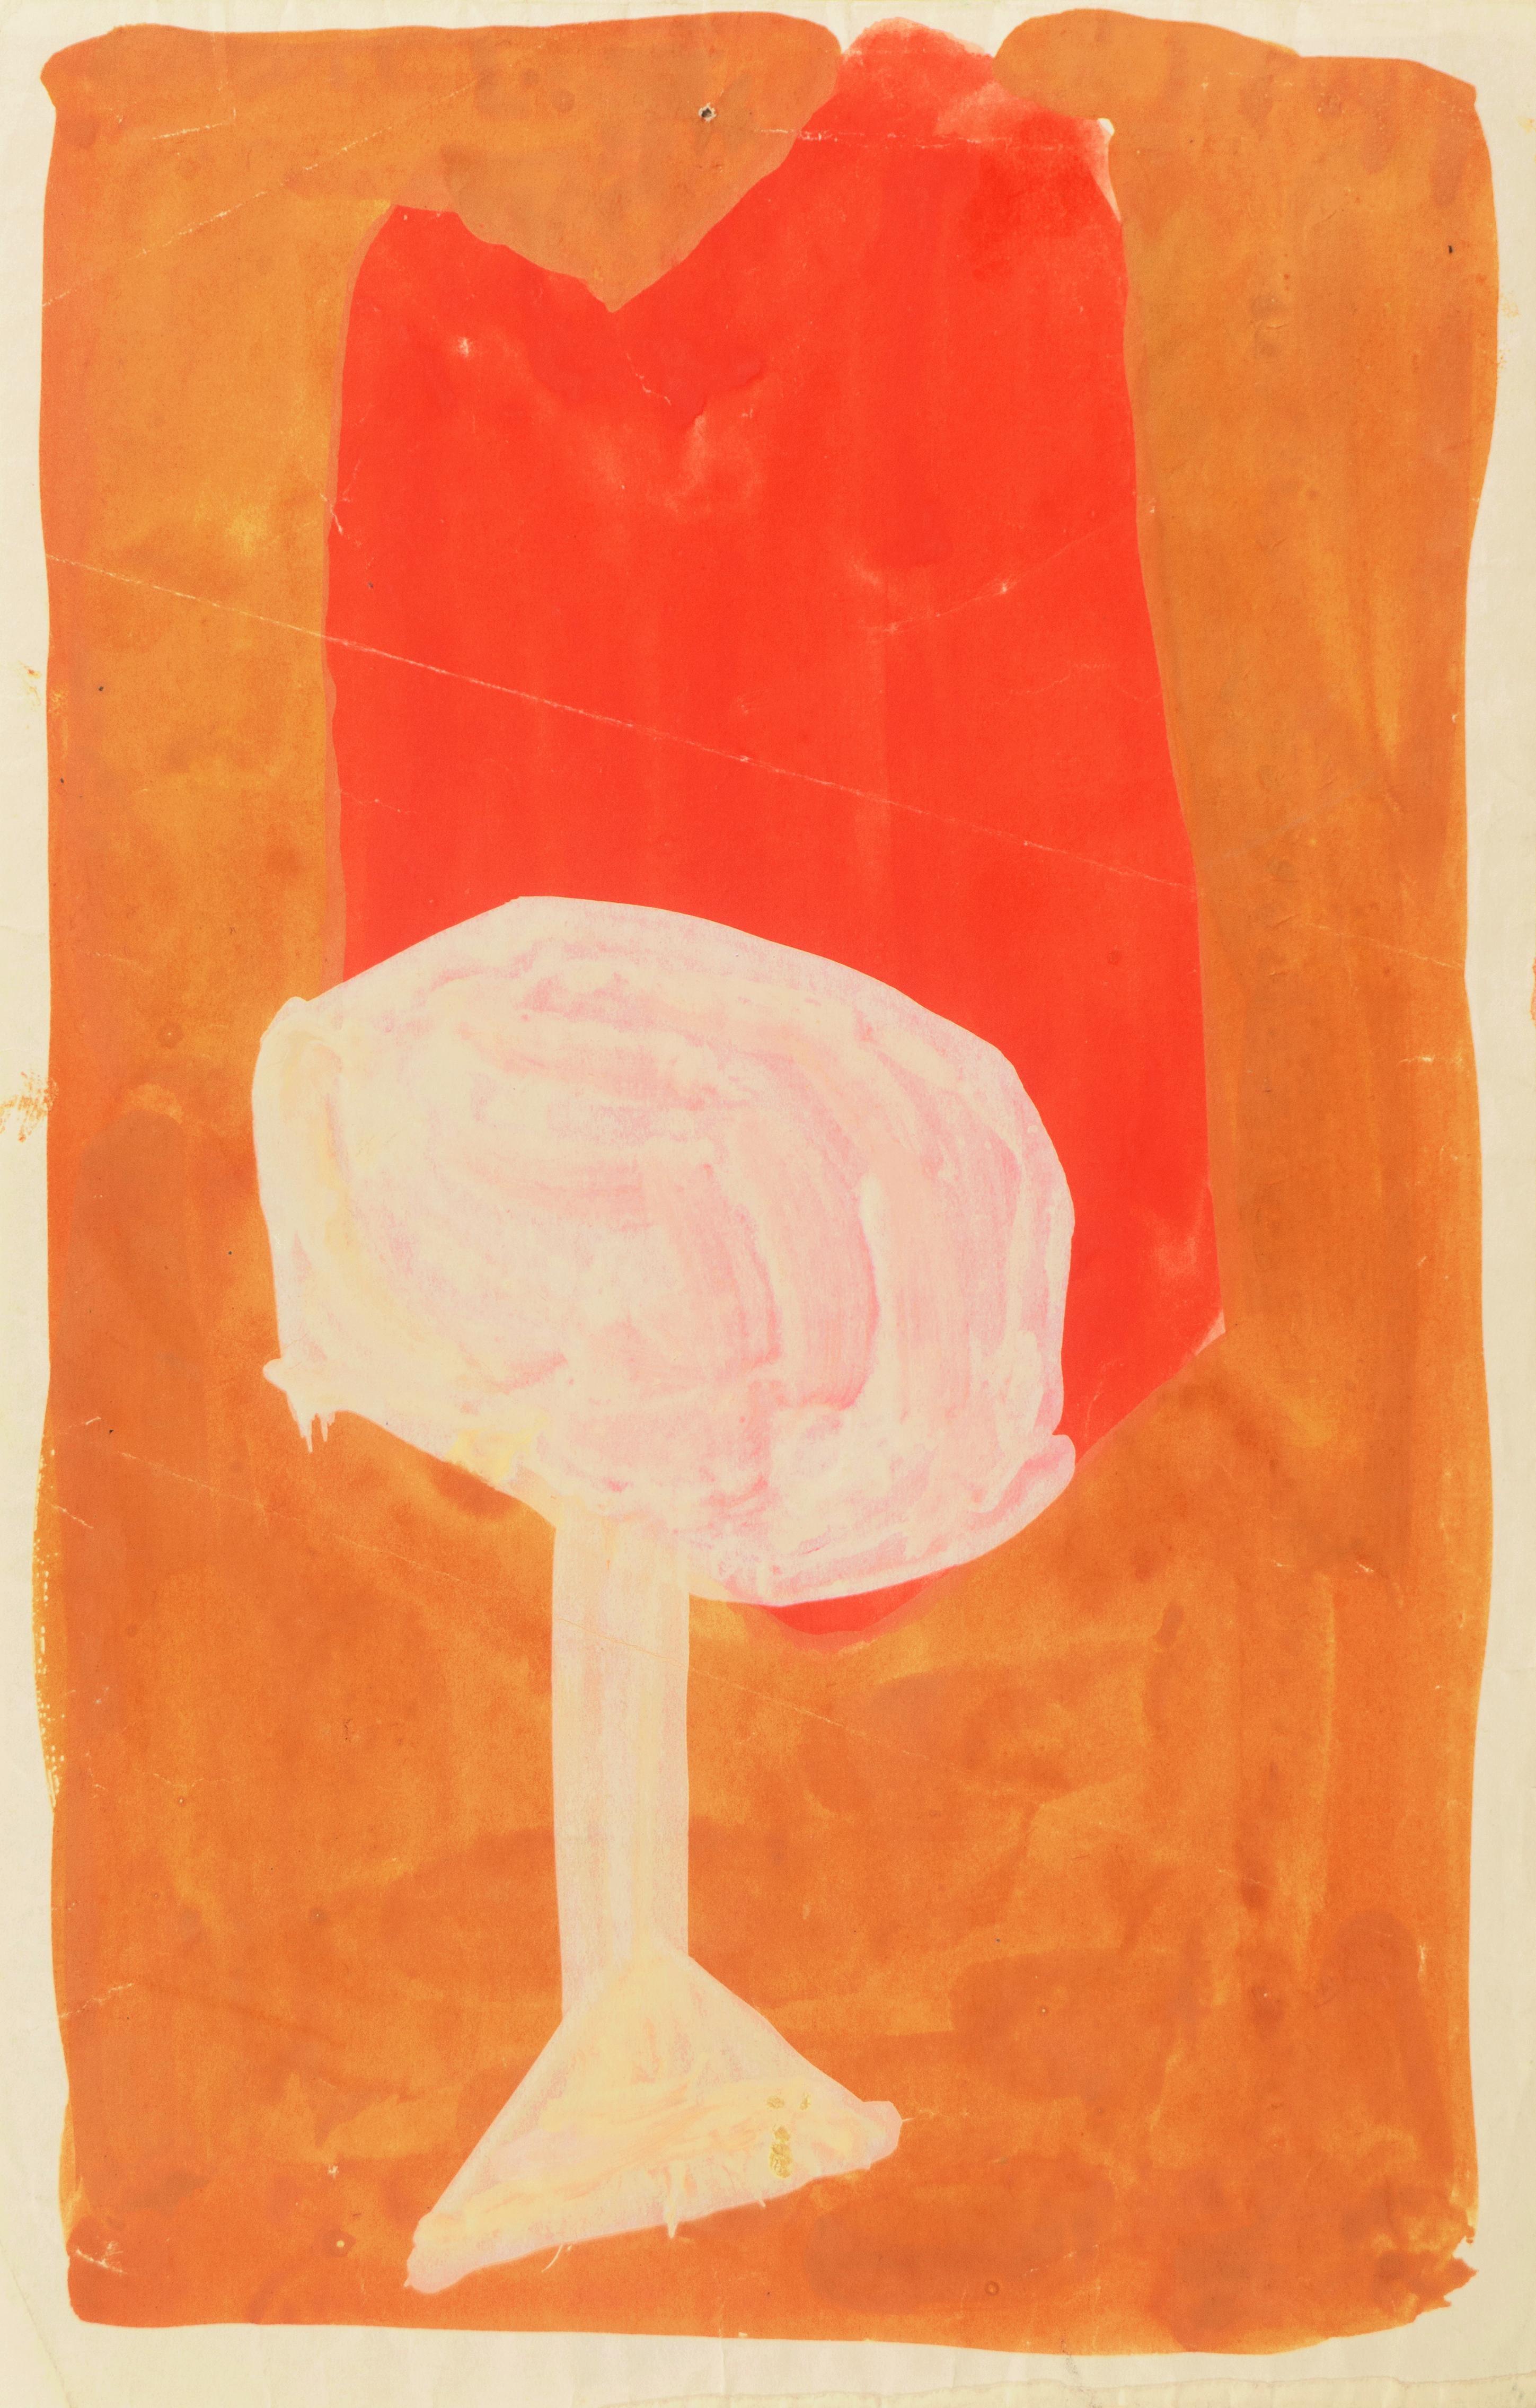 'White Table and Red Cloth', Louvre, Paris, Carmel, California, SFAA, LACMA